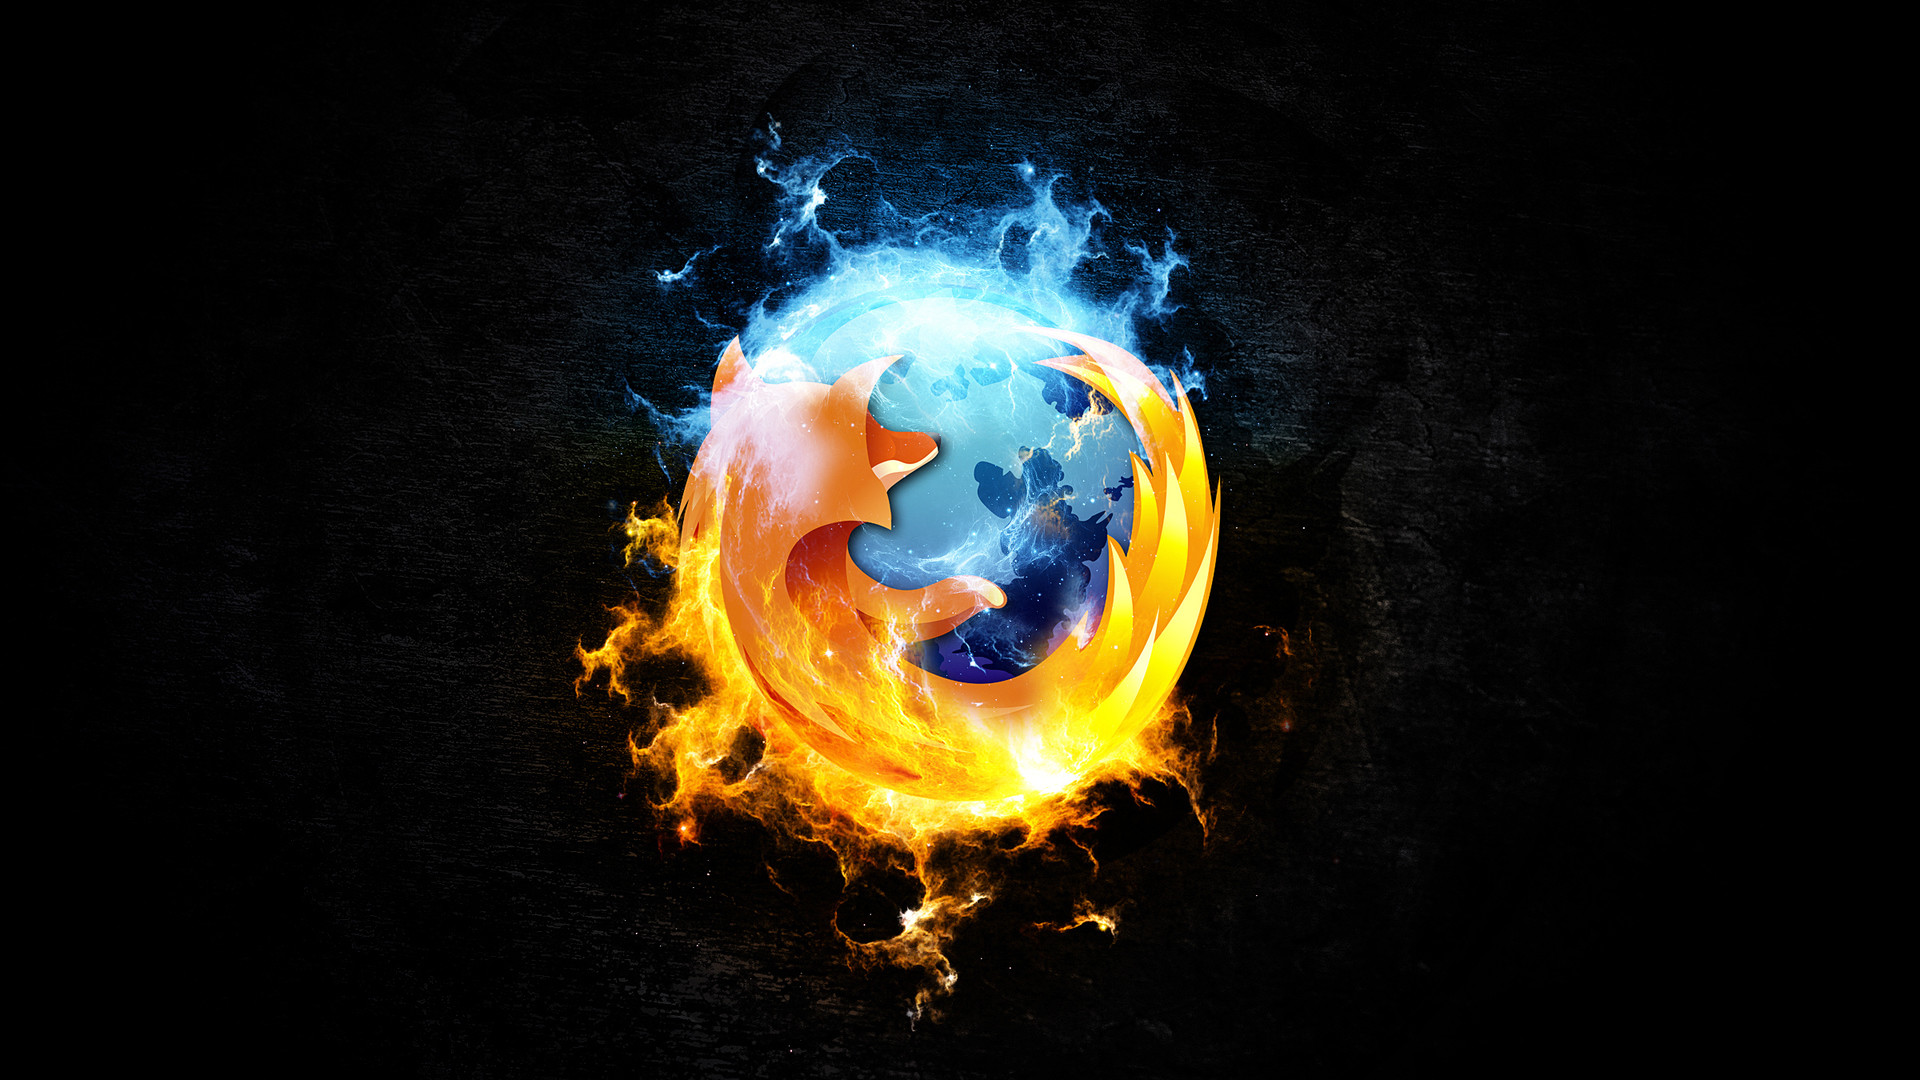 Mozilla Firefox Wallpaper